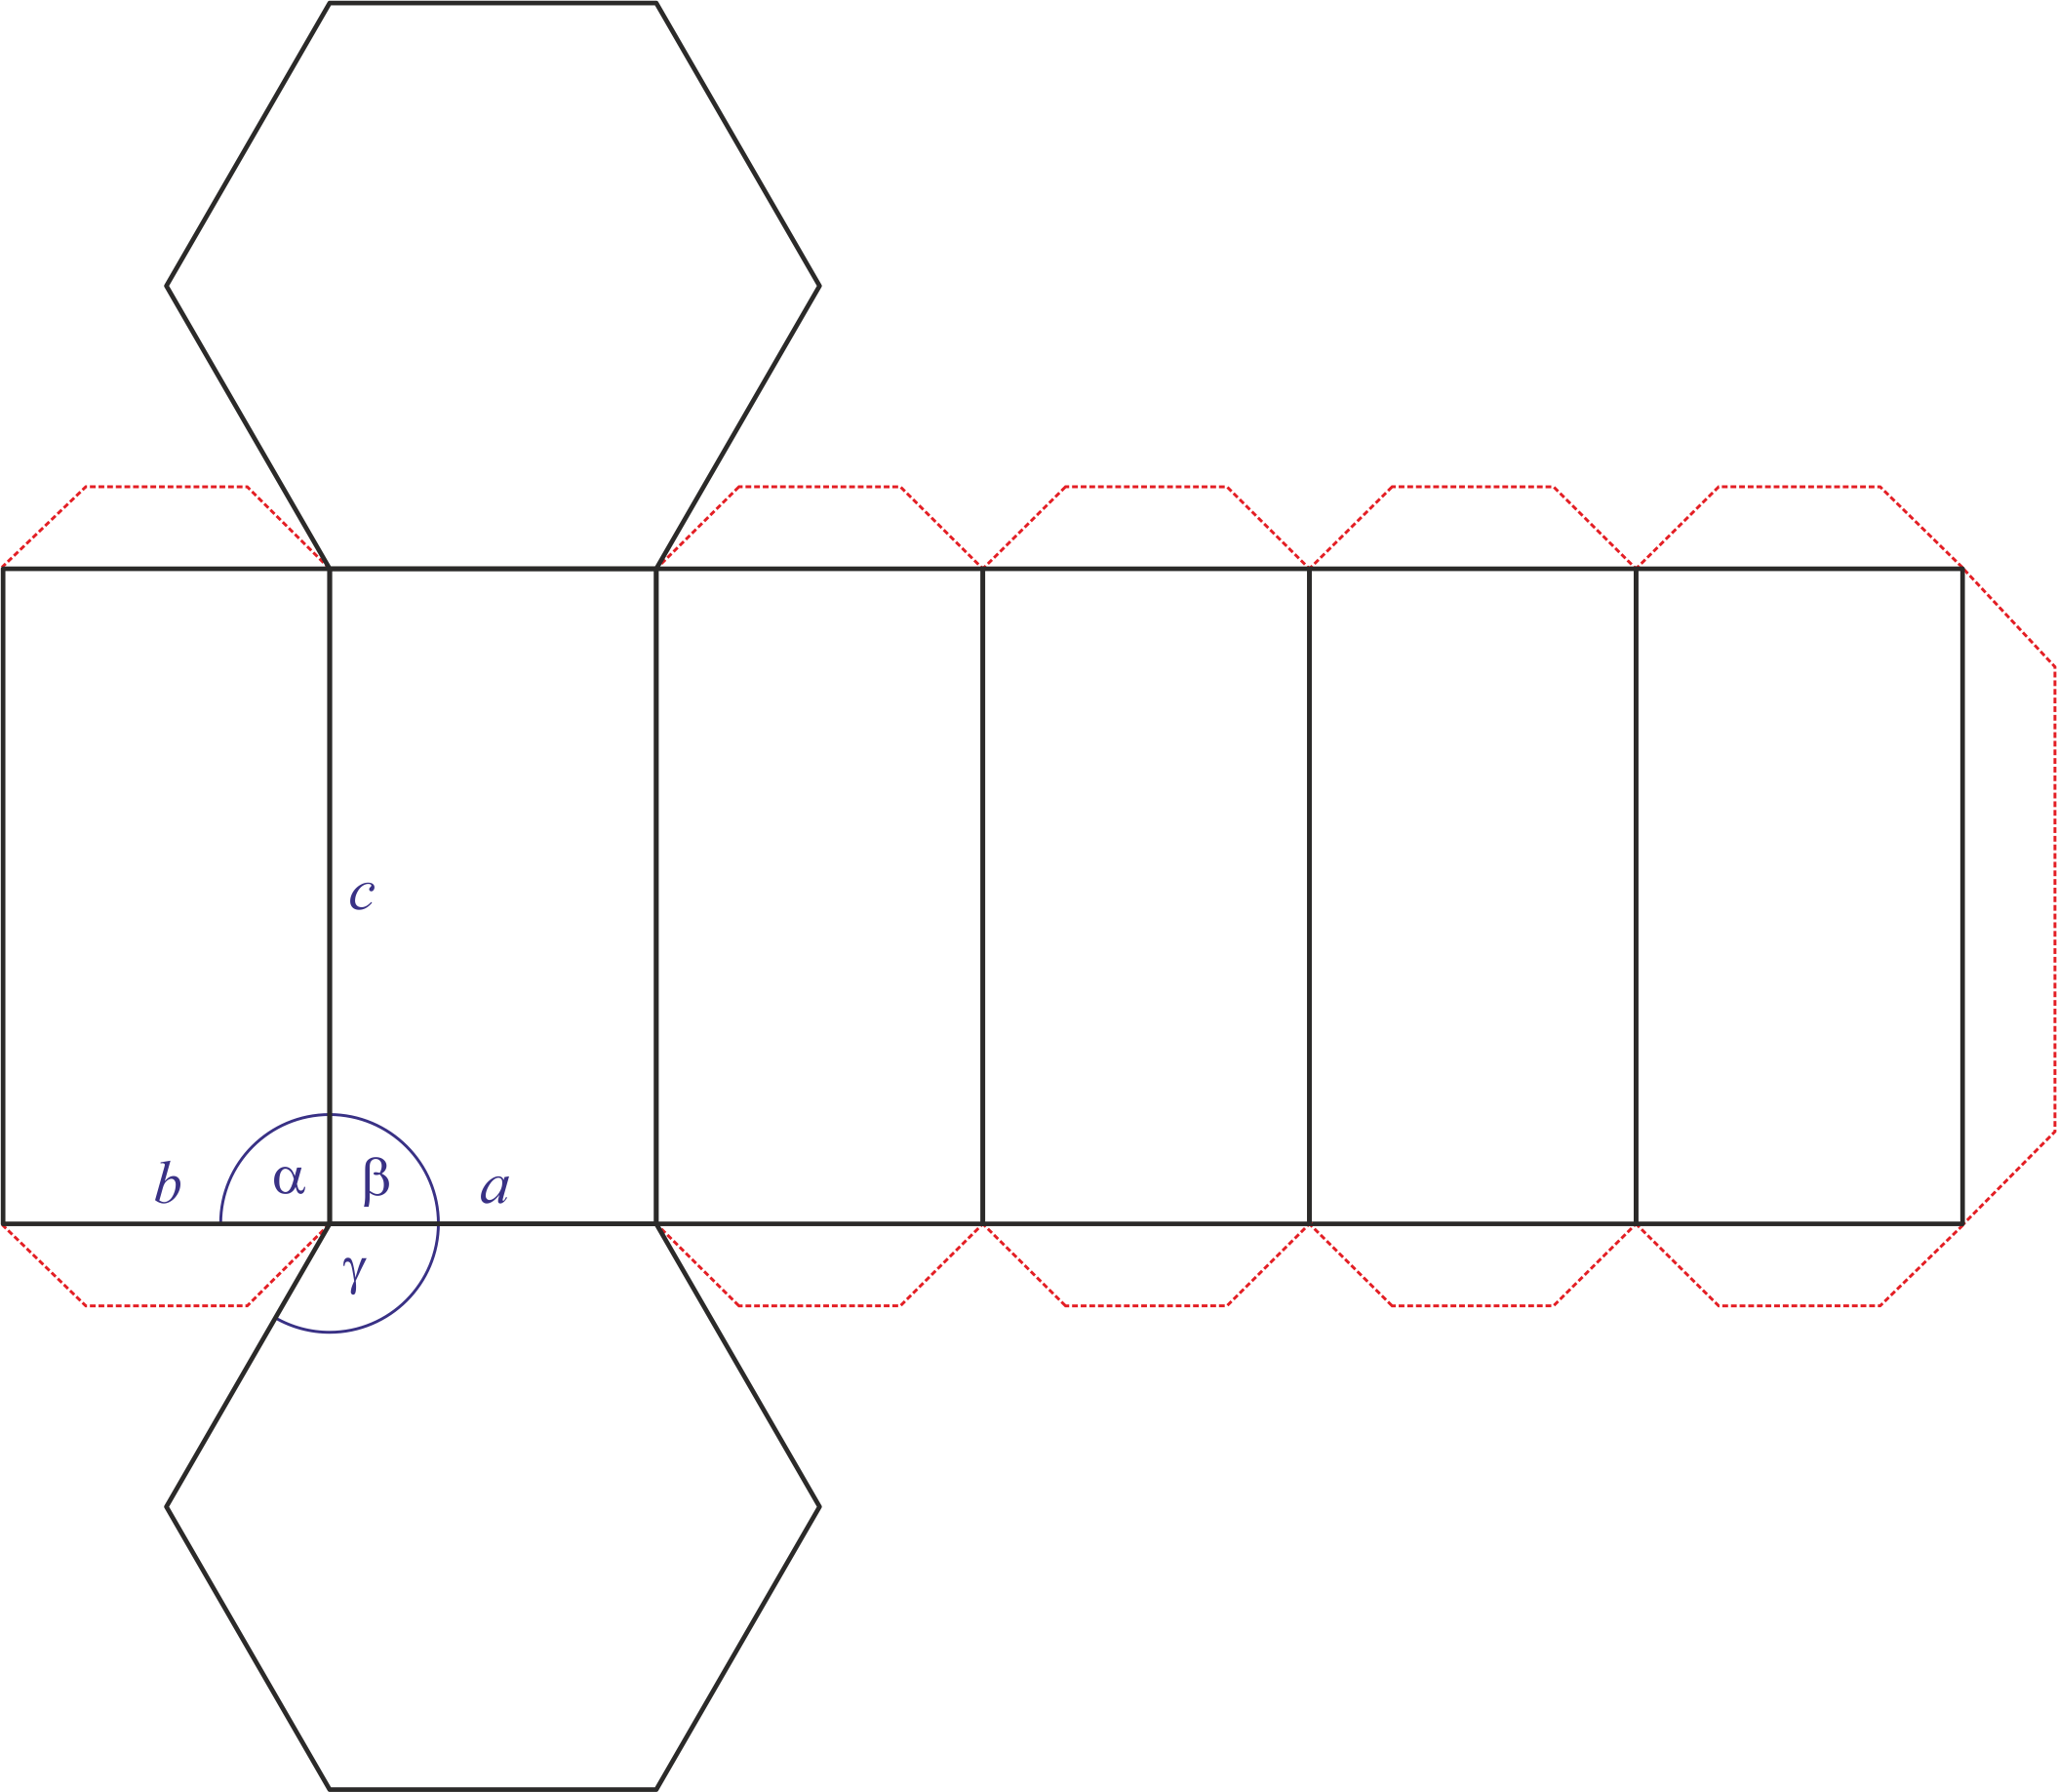 3d_model_of_triple_hexagonal_unit_cell.png.